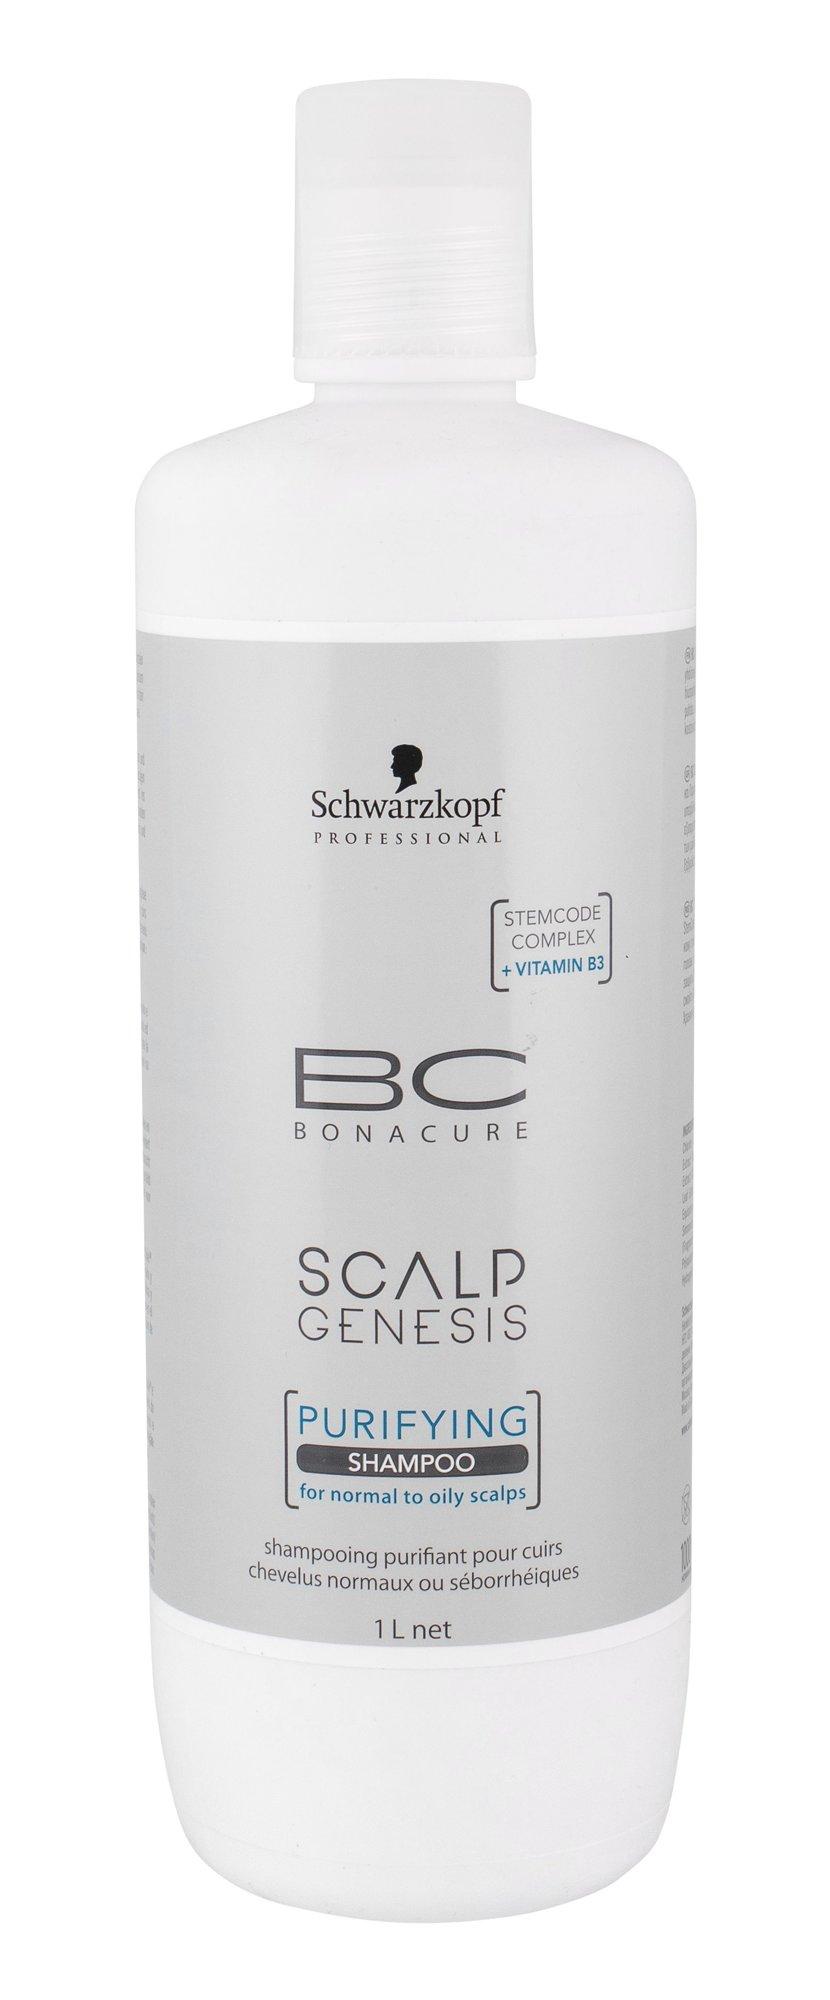 Šampūnas Schwarzkopf BC Bonacure Scalp Genesis